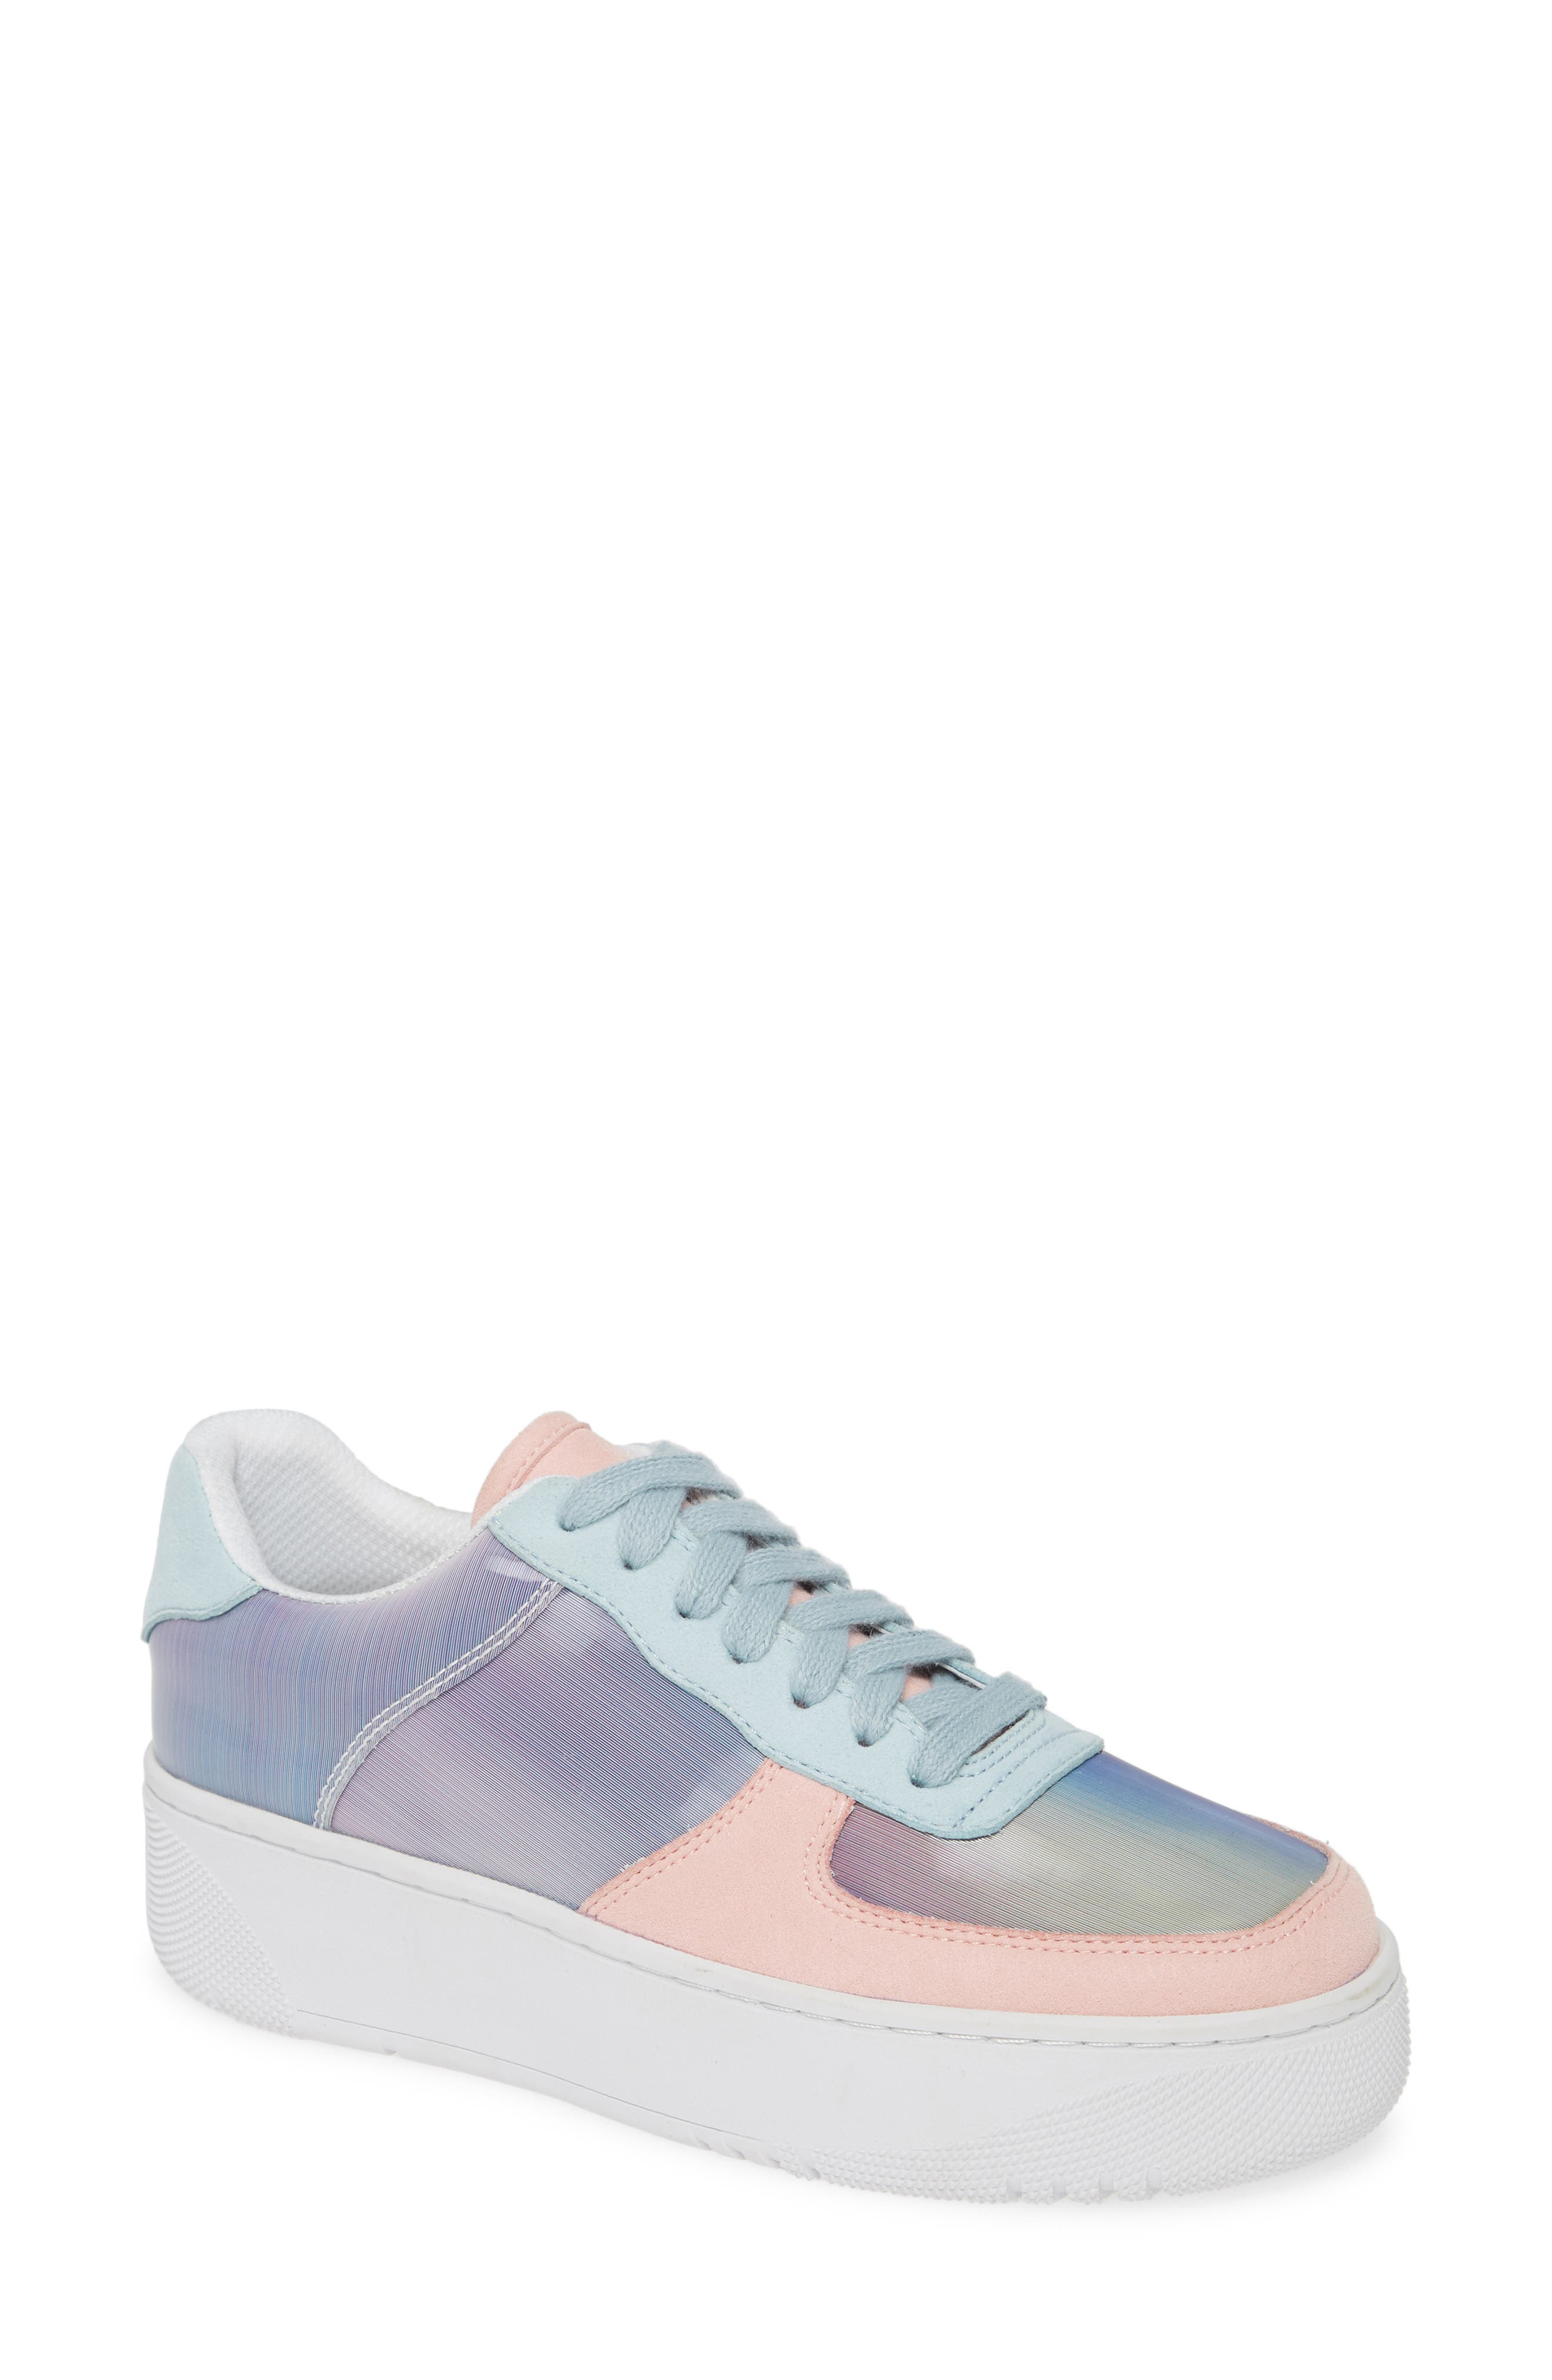 Sneakers Jeffrey Campbell   Nordstrom